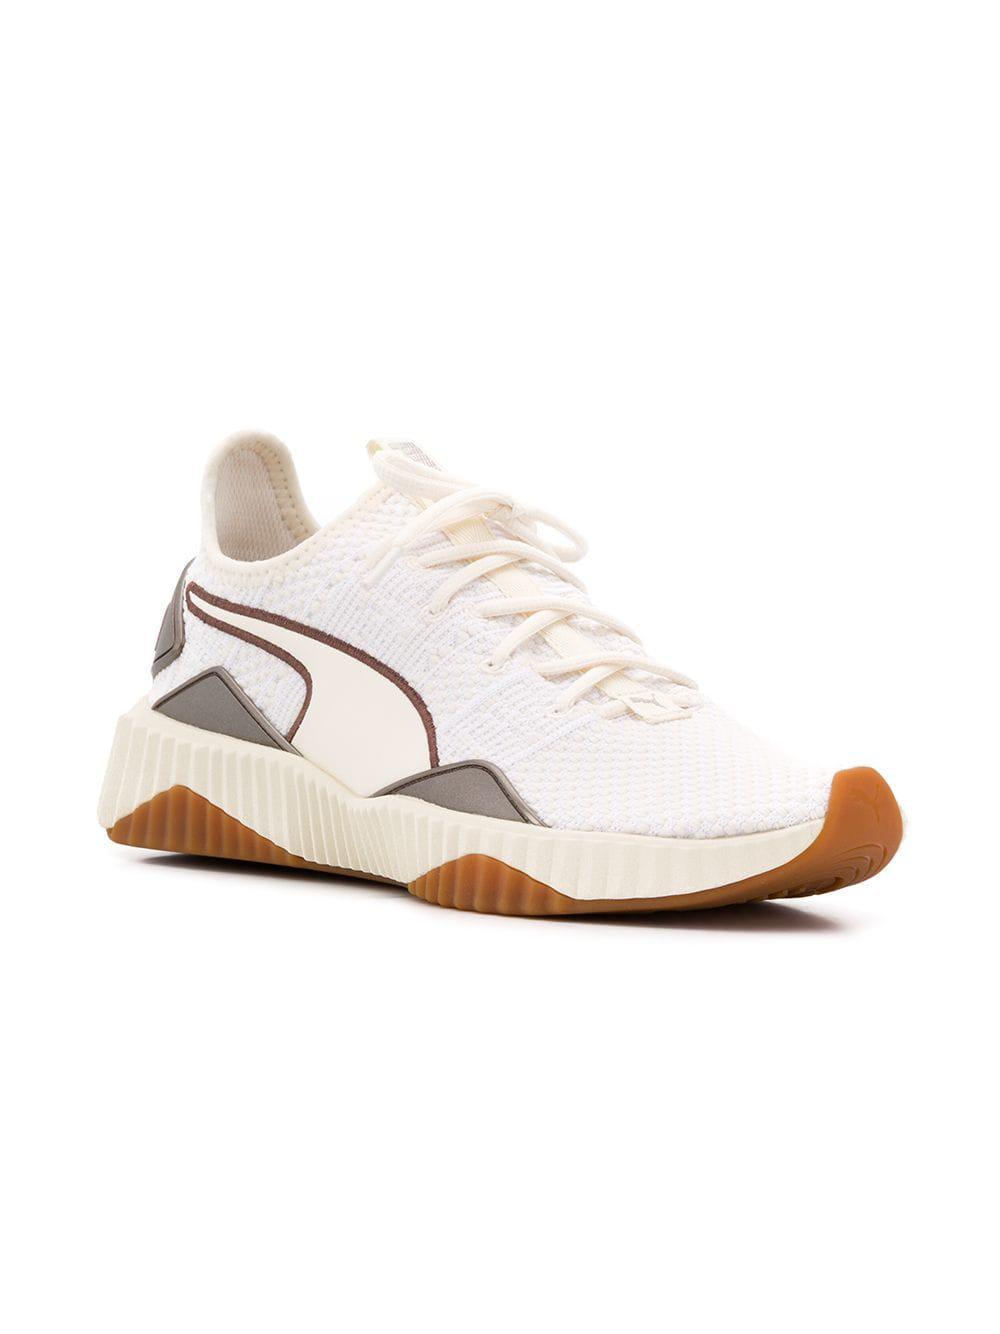 761872f047f0 Lyst - PUMA Defy Luxe Selena Gomez Sneakers in White